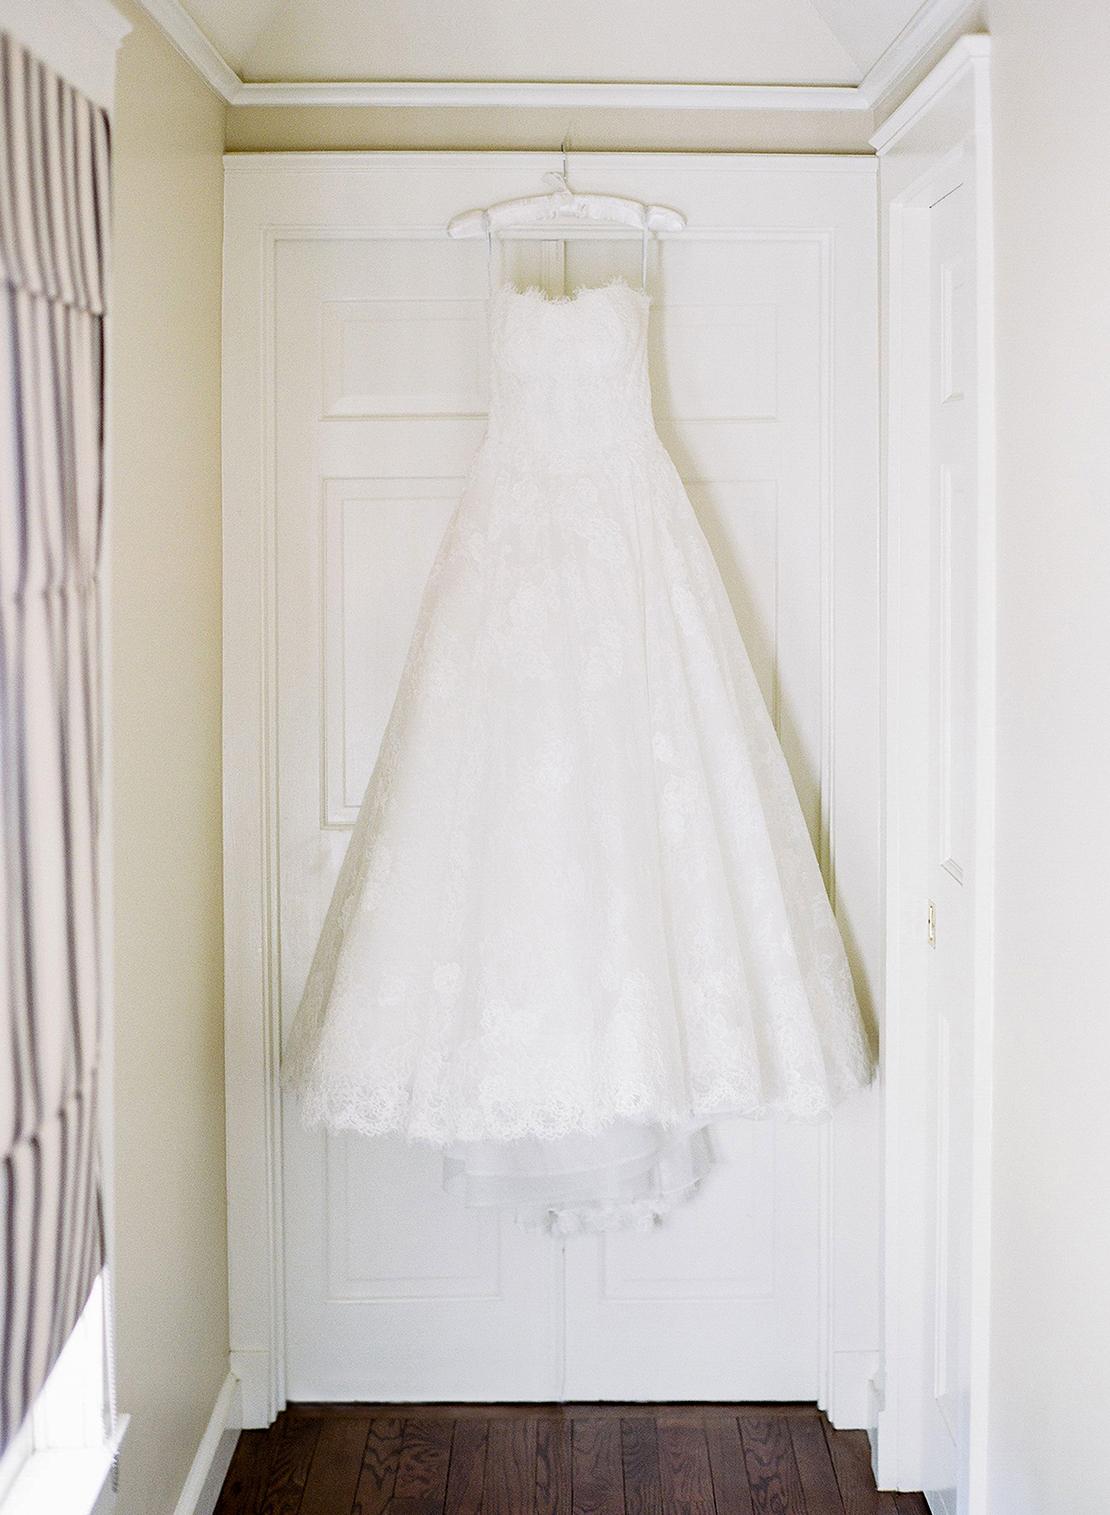 01_monique_lhuillier_lace_wedding_gown_Charles_Orvis_Inn_Equinox_Resort_Vermont